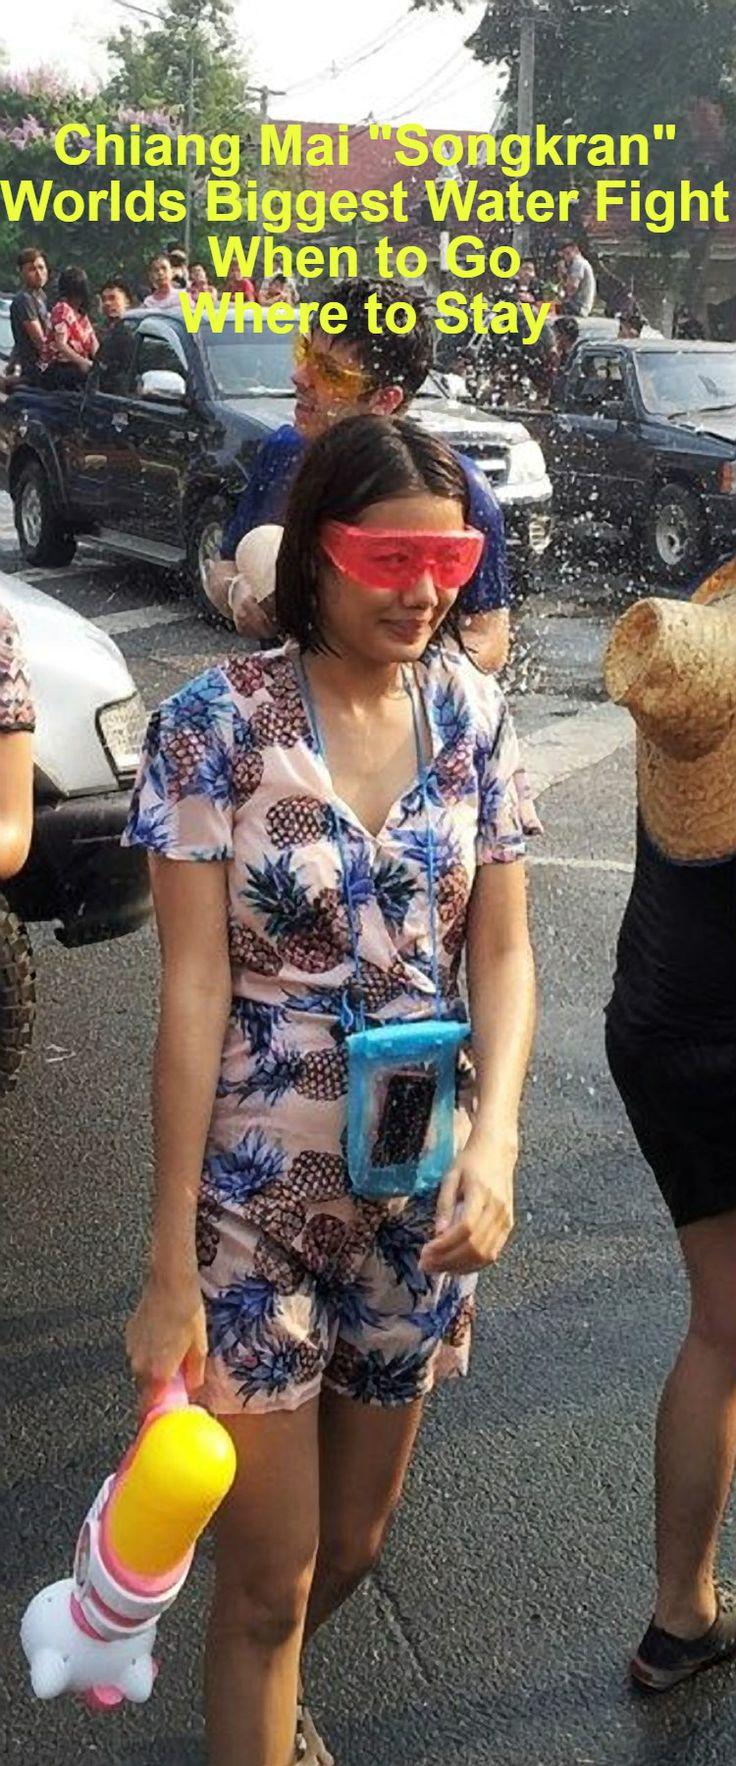 The Chiang Mai water fight: Songkran.